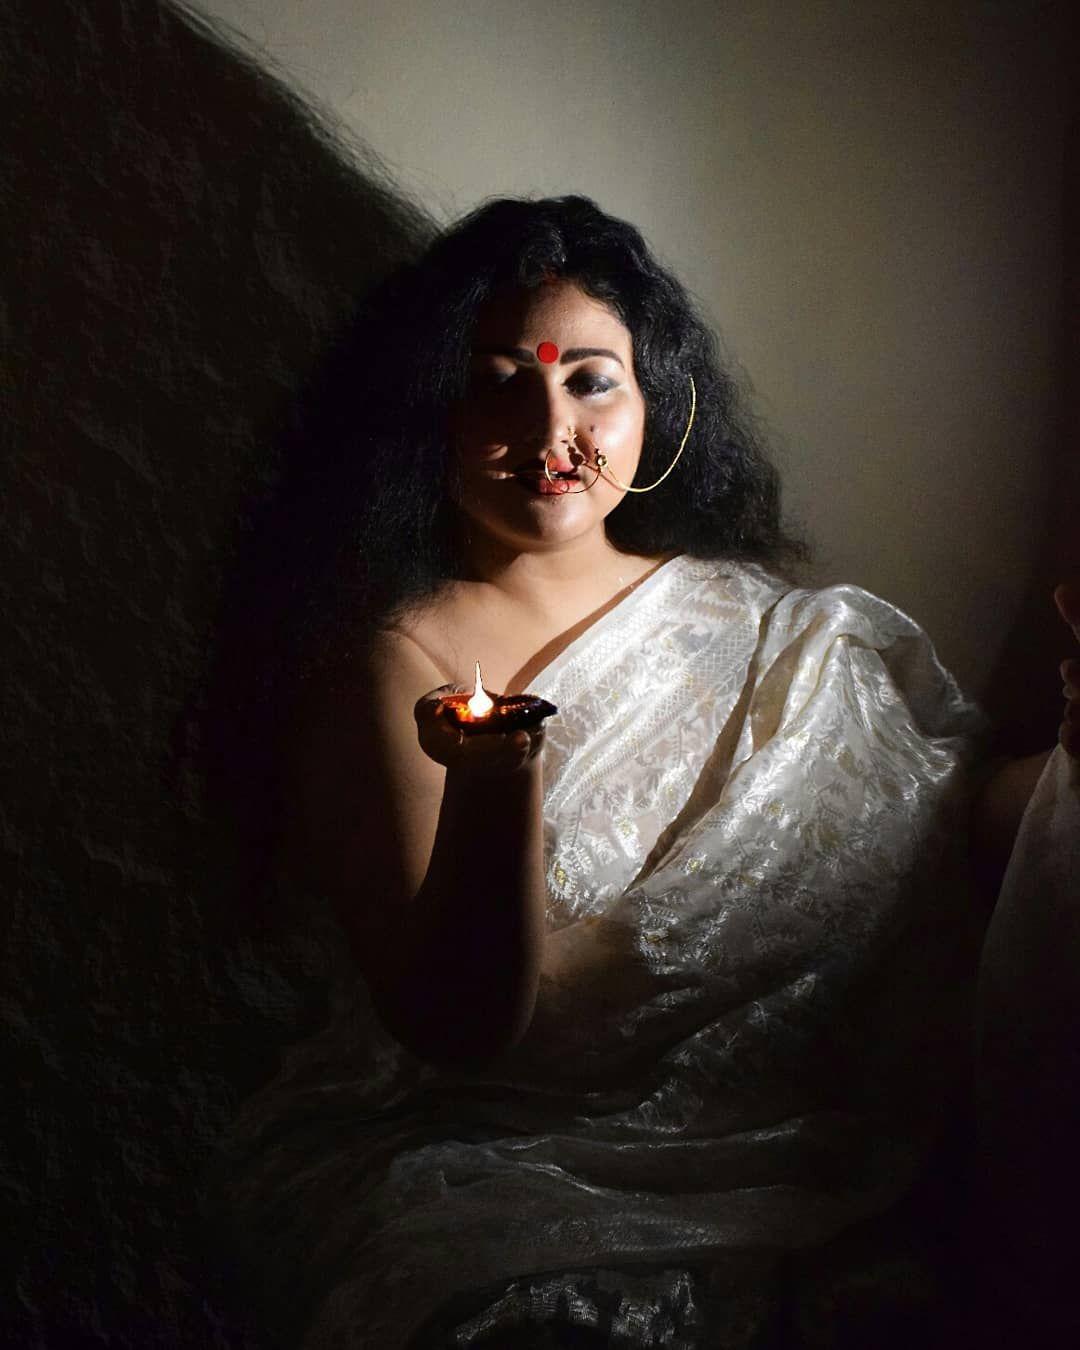 Navratri Durga Puja Maha Gauri The Eighth Avatar Of Goddess